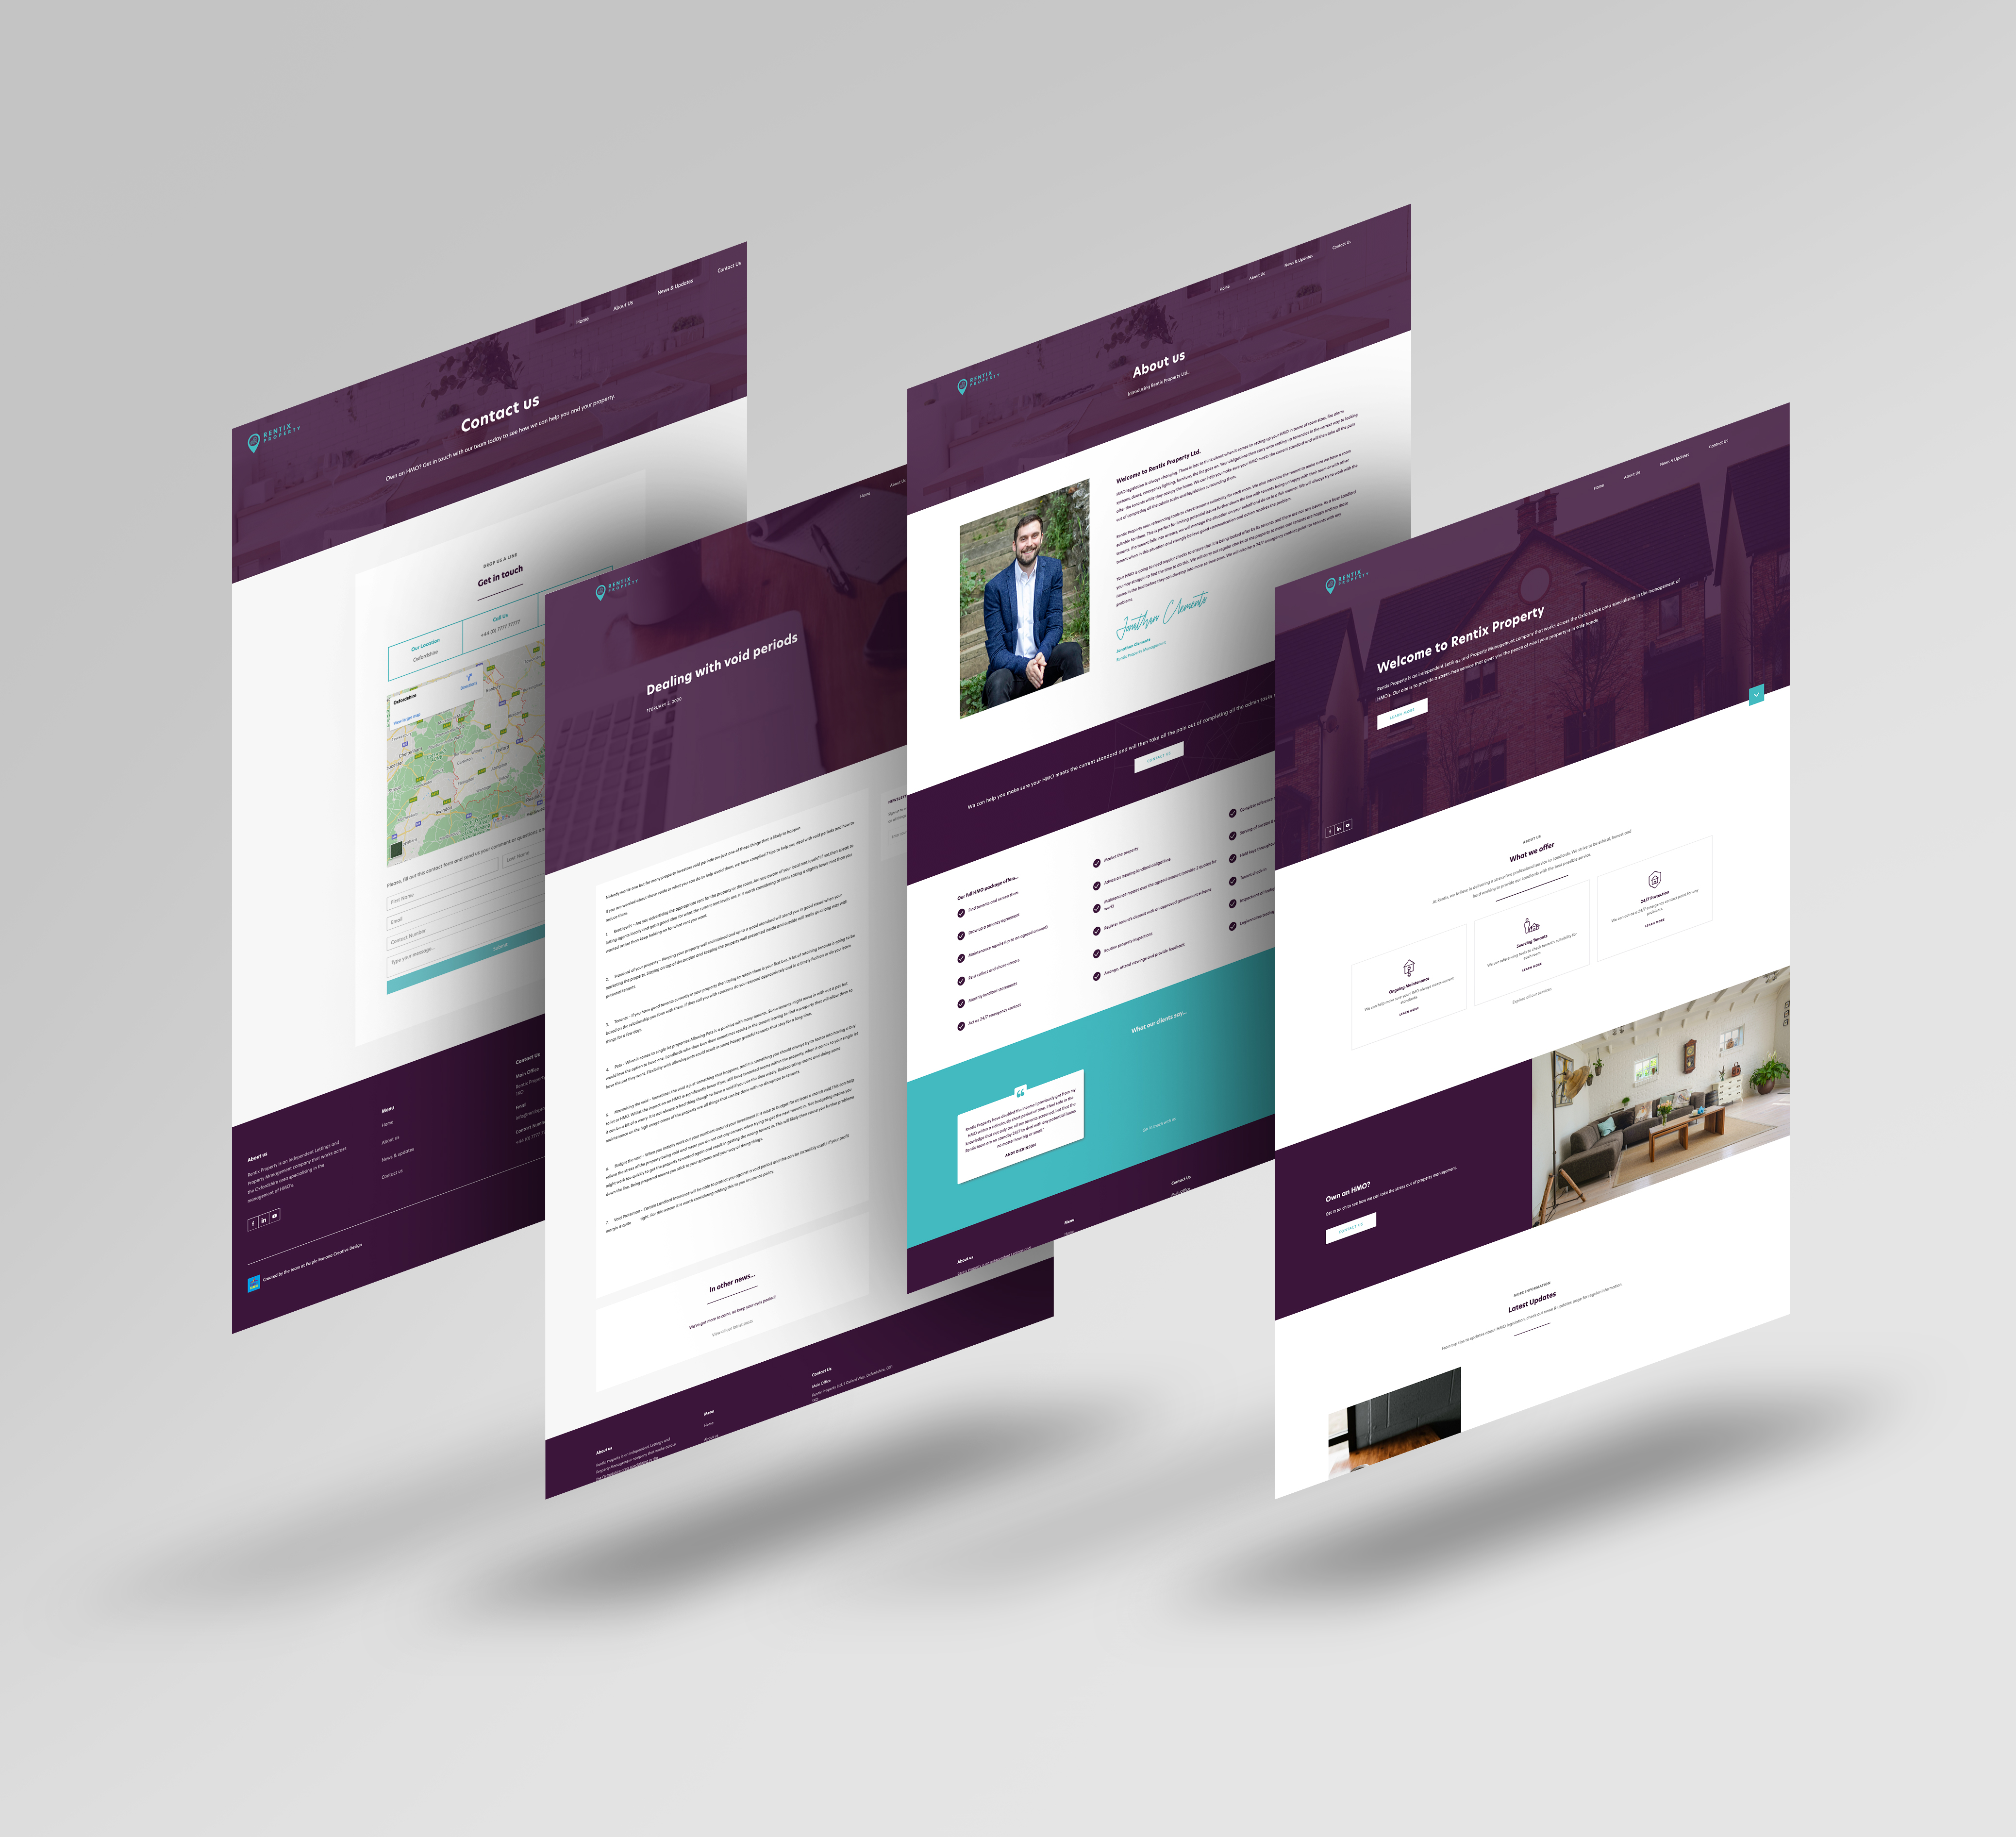 Rentix Property website mockup